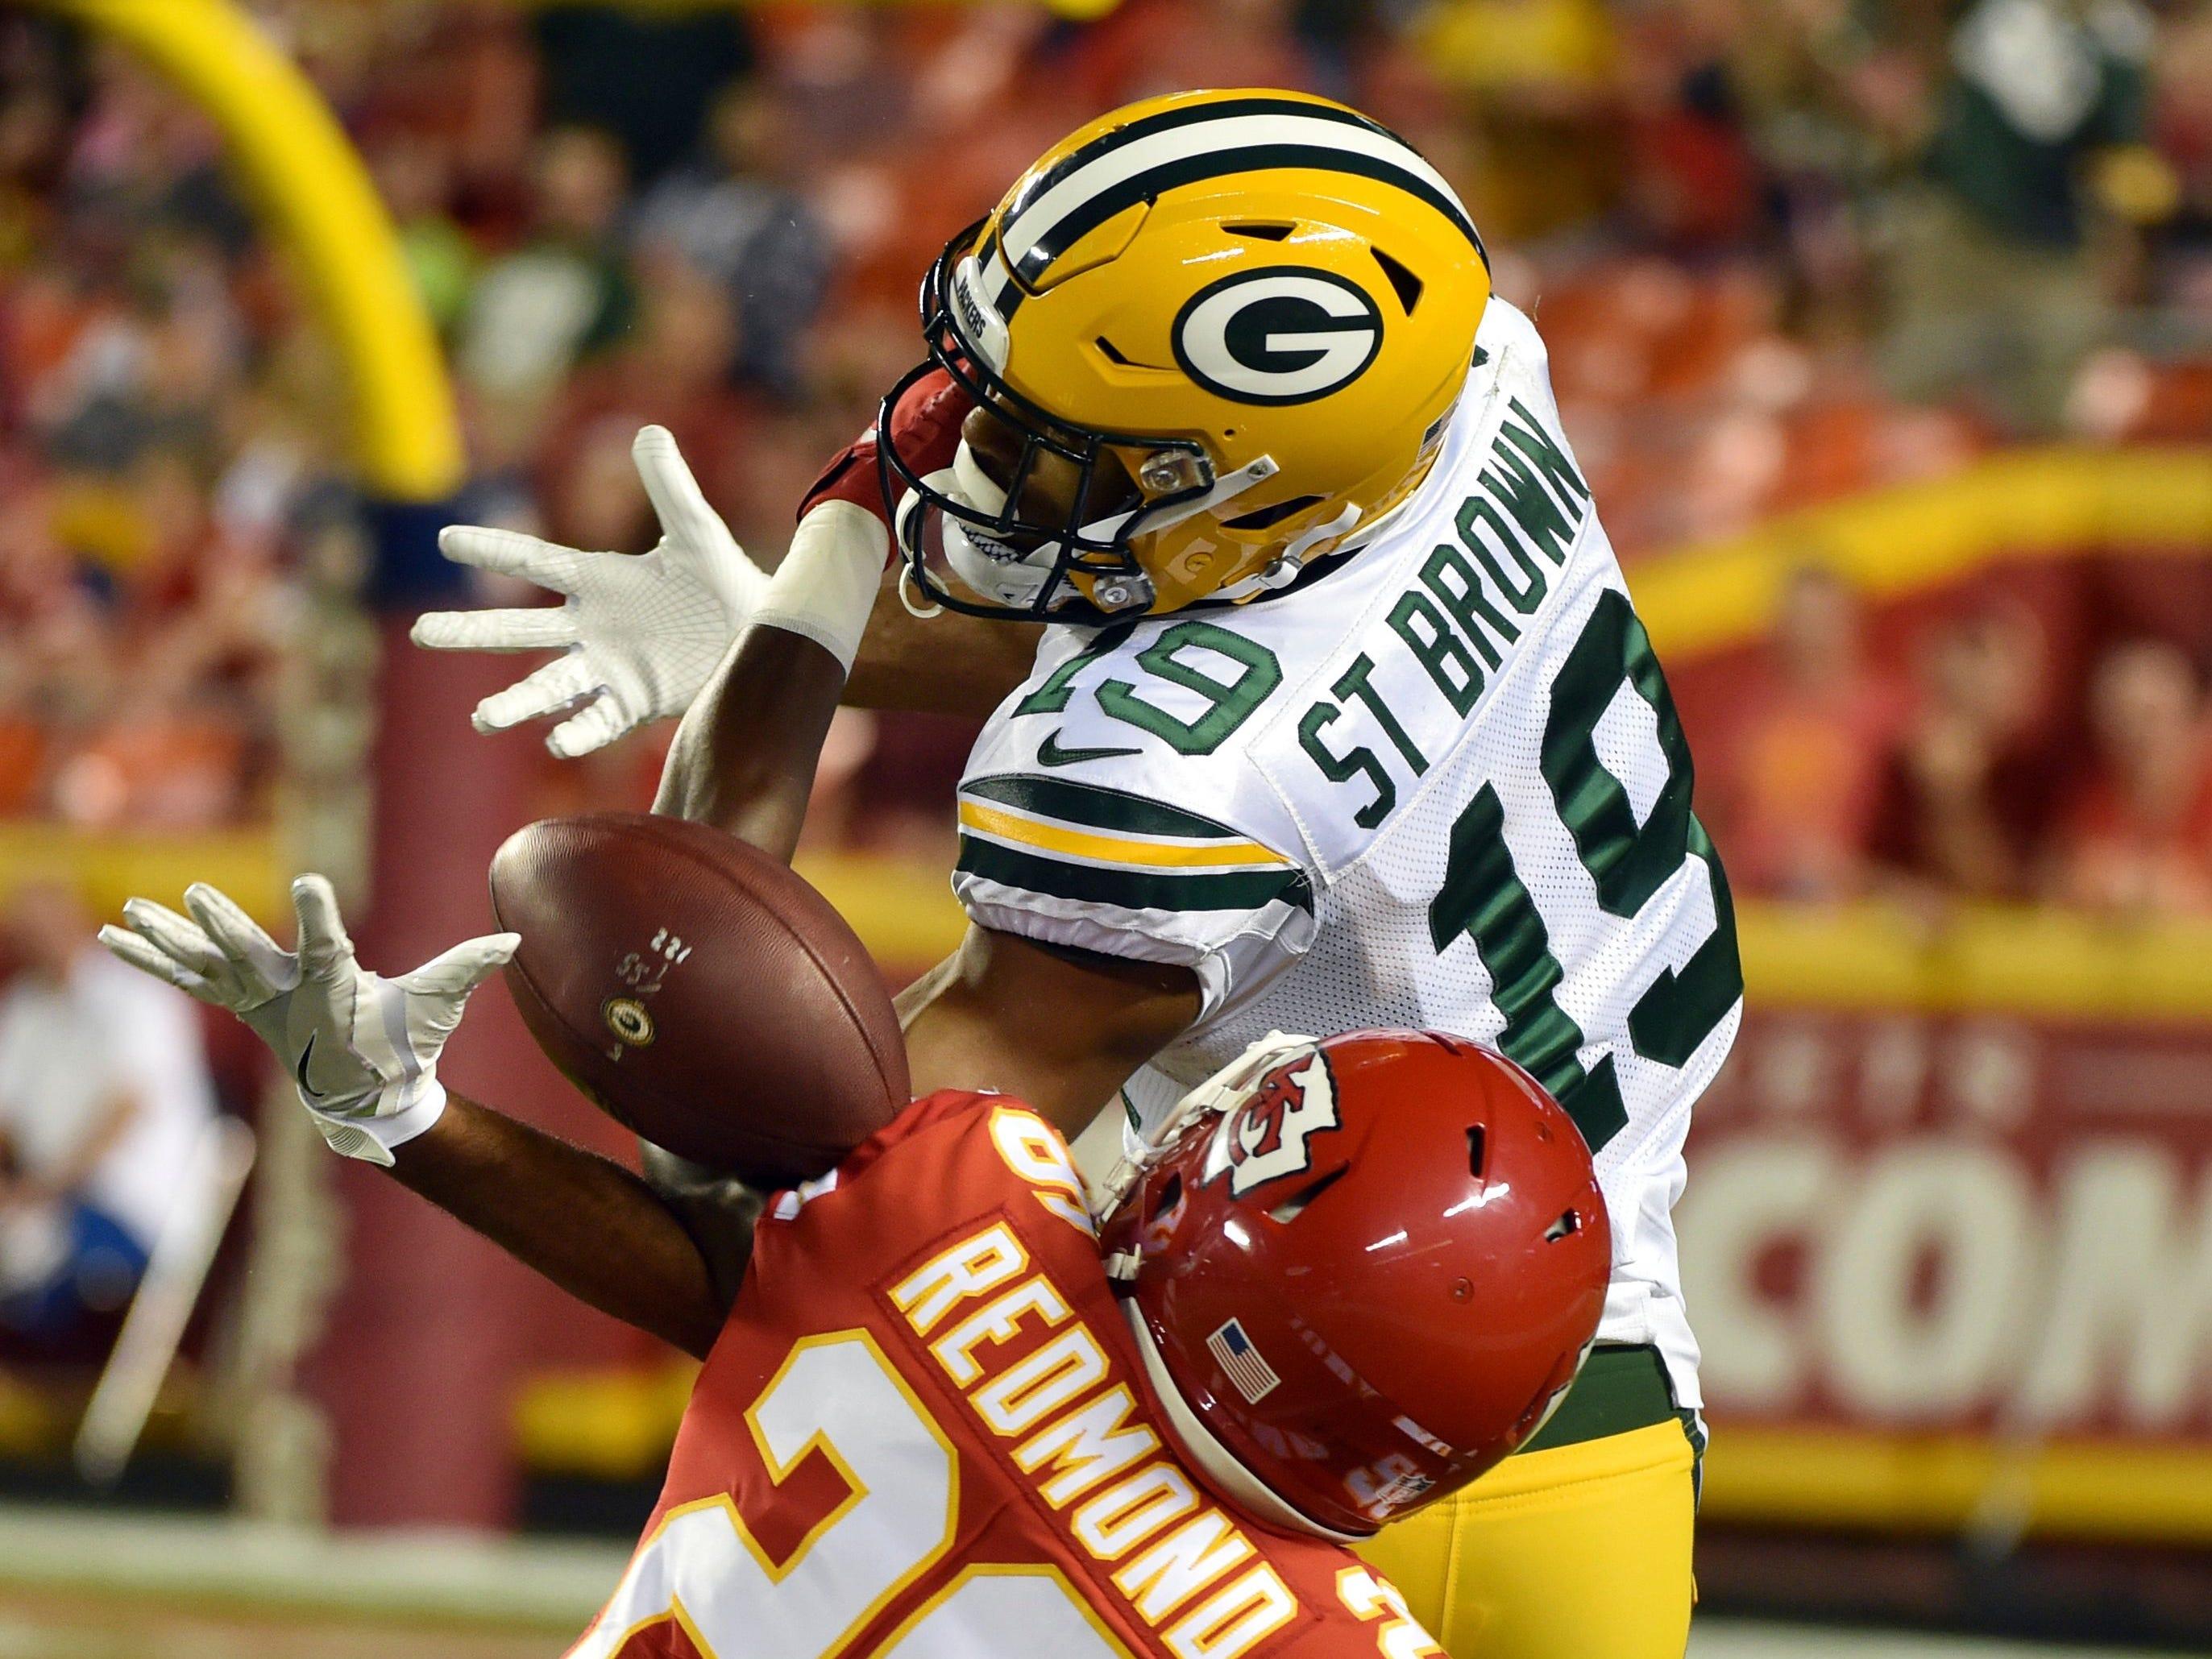 Week 8: Packers at Chiefs, 7:20 p.m. CT Sunday, Oct. 27, Arrowhead Stadium (NBC)